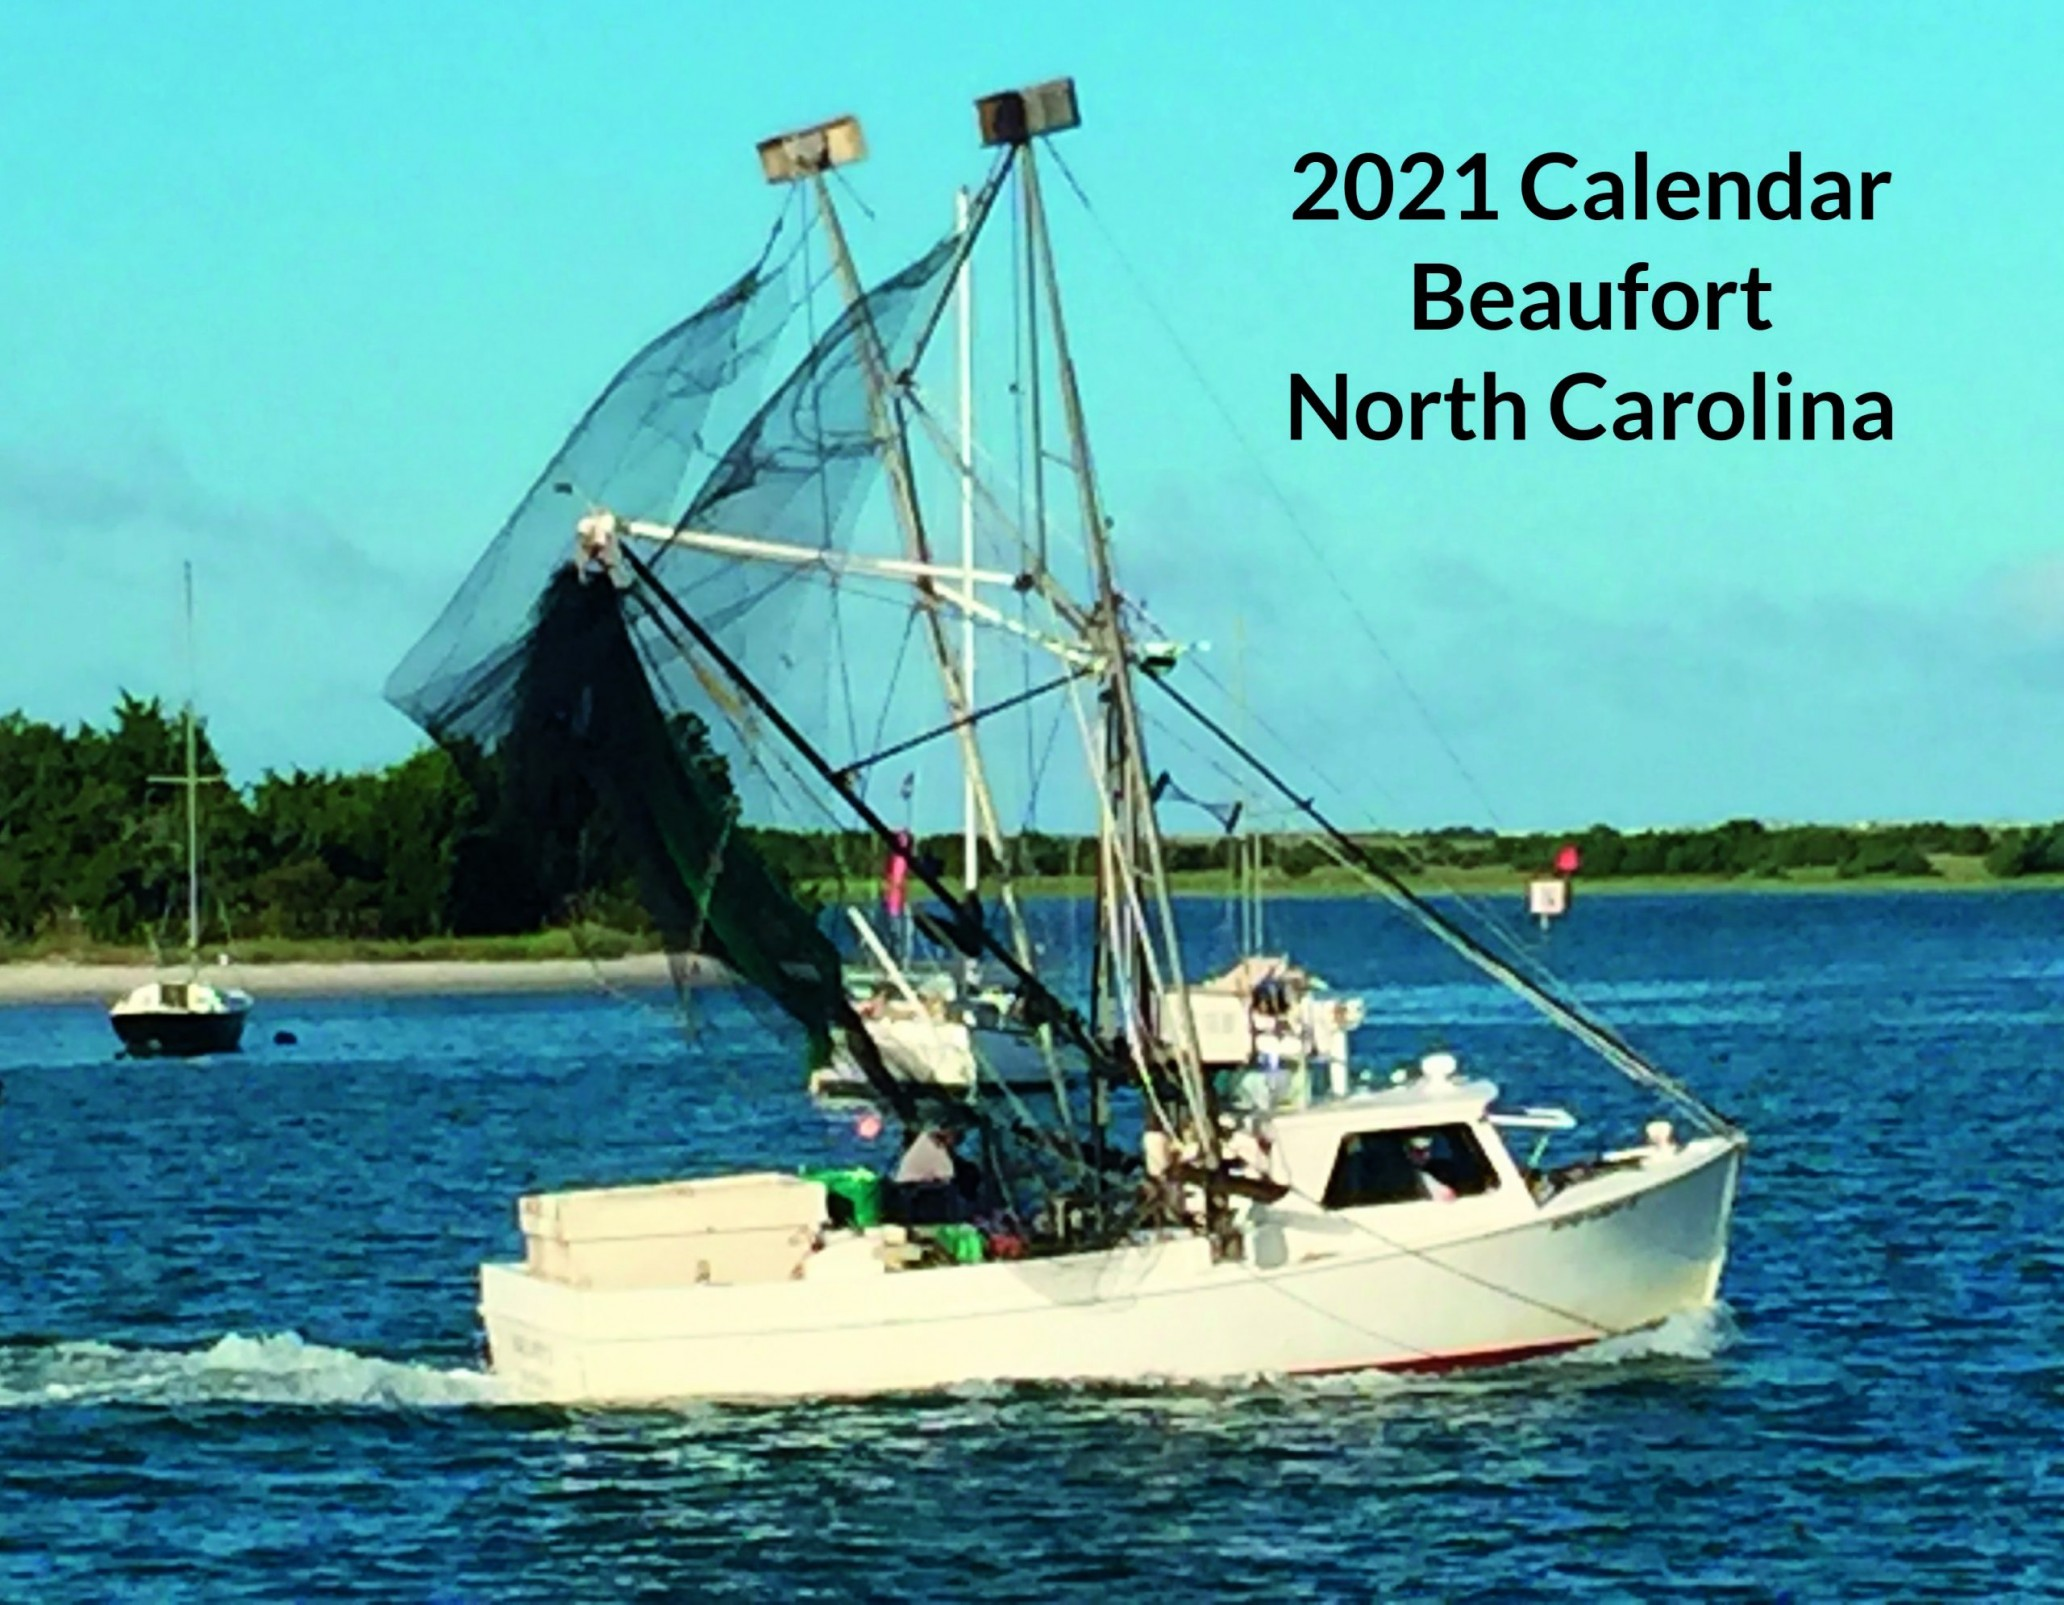 Beaufort Nc Christmas Parade 2021 2021 Beaufort Calendar Beaufort North Carolina Named Best Small Town For Adventure